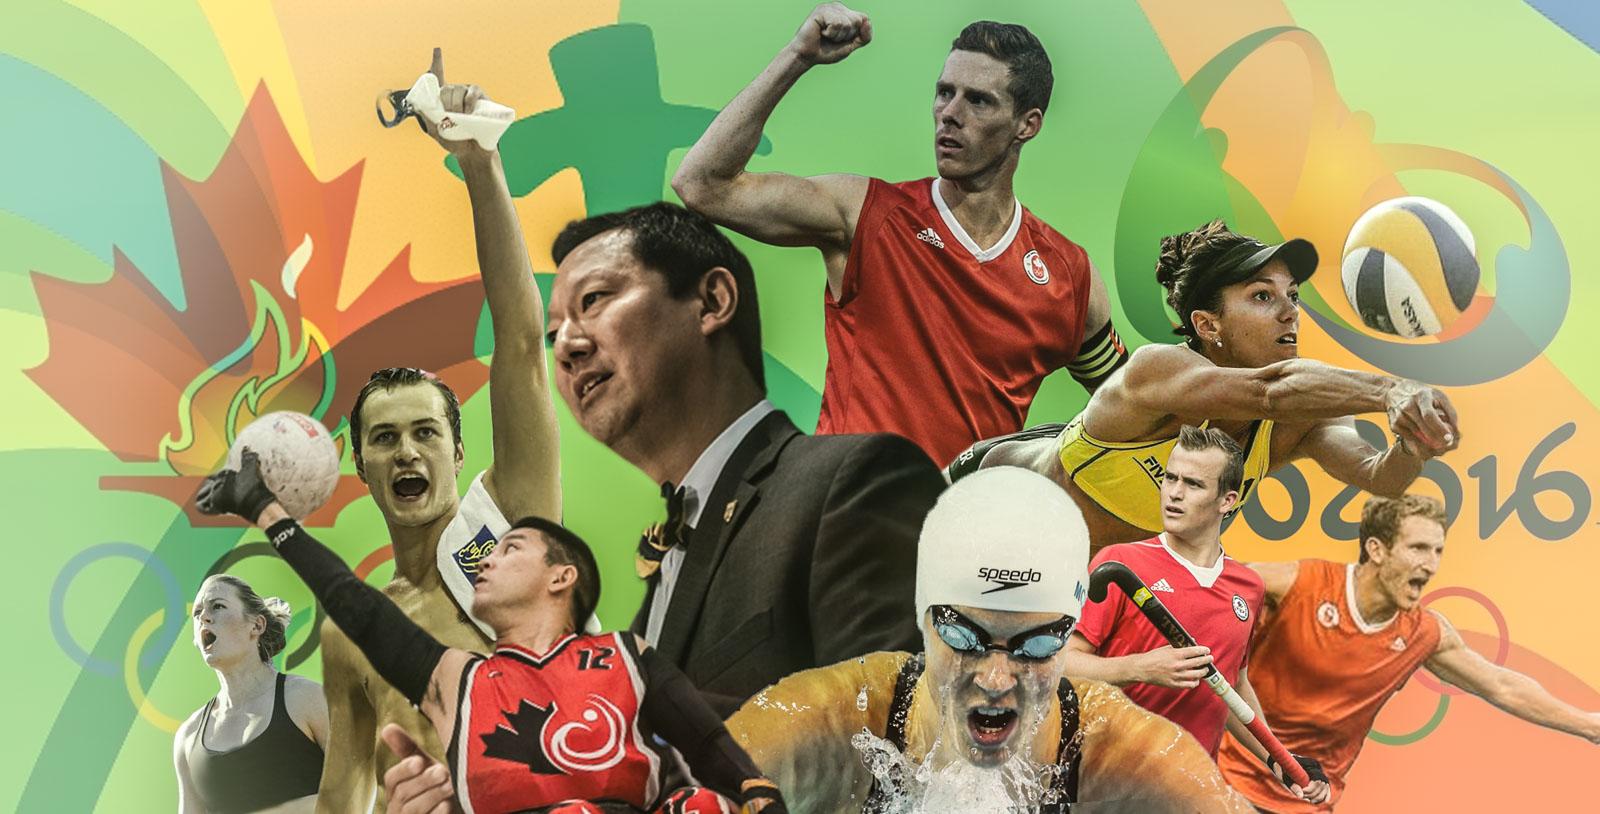 UBC student-athletes made their presence felt at Rio de Janeiro this summer.